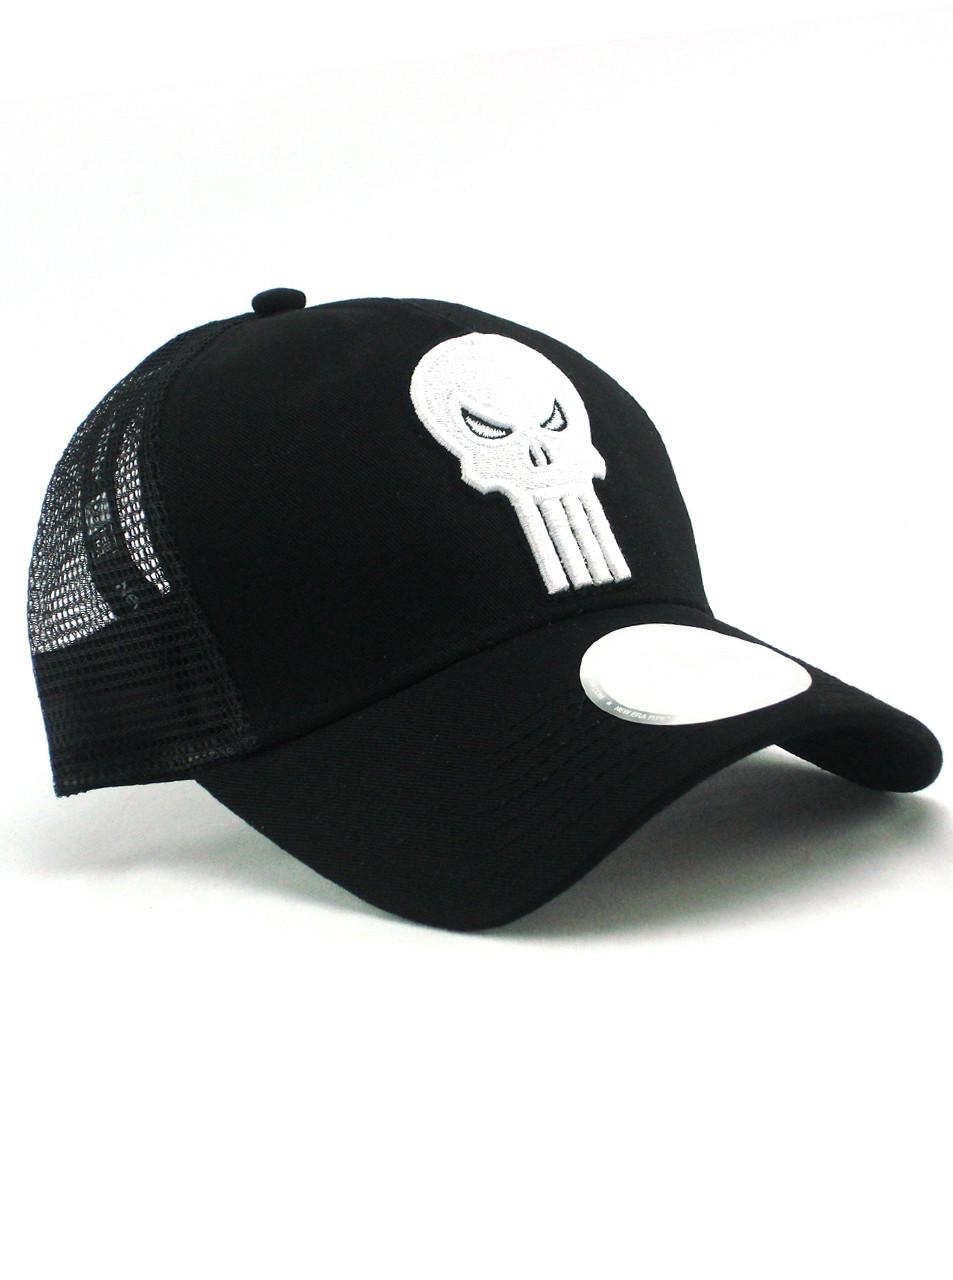 0a8af7f8394 New Era Punisher Adjustable Trucker Hat View 1